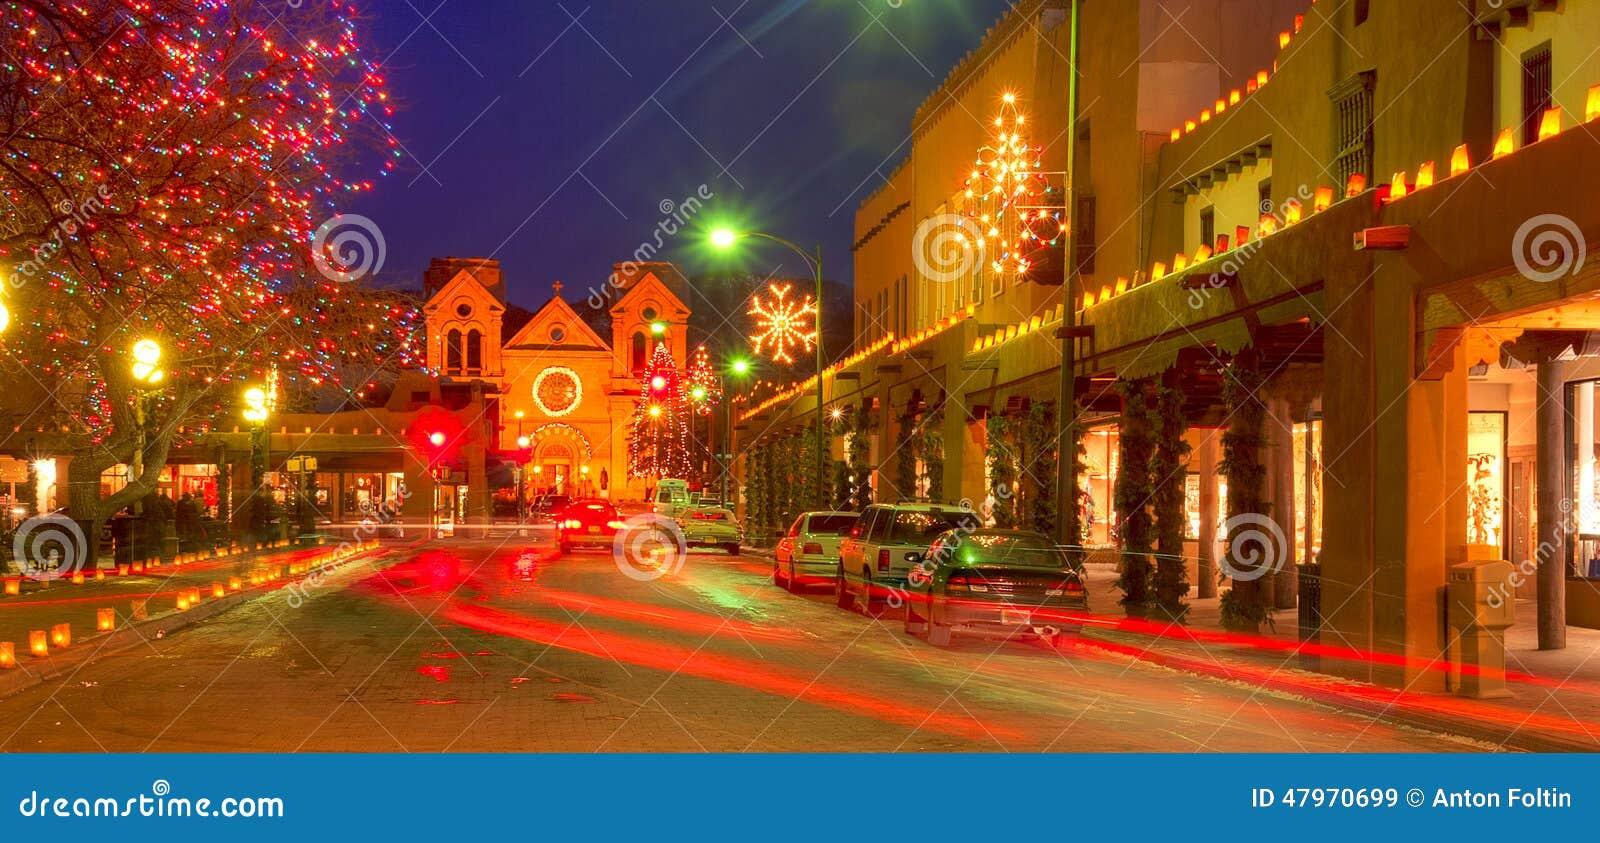 santa fe street with christmas lights - Christmas In Santa Fe